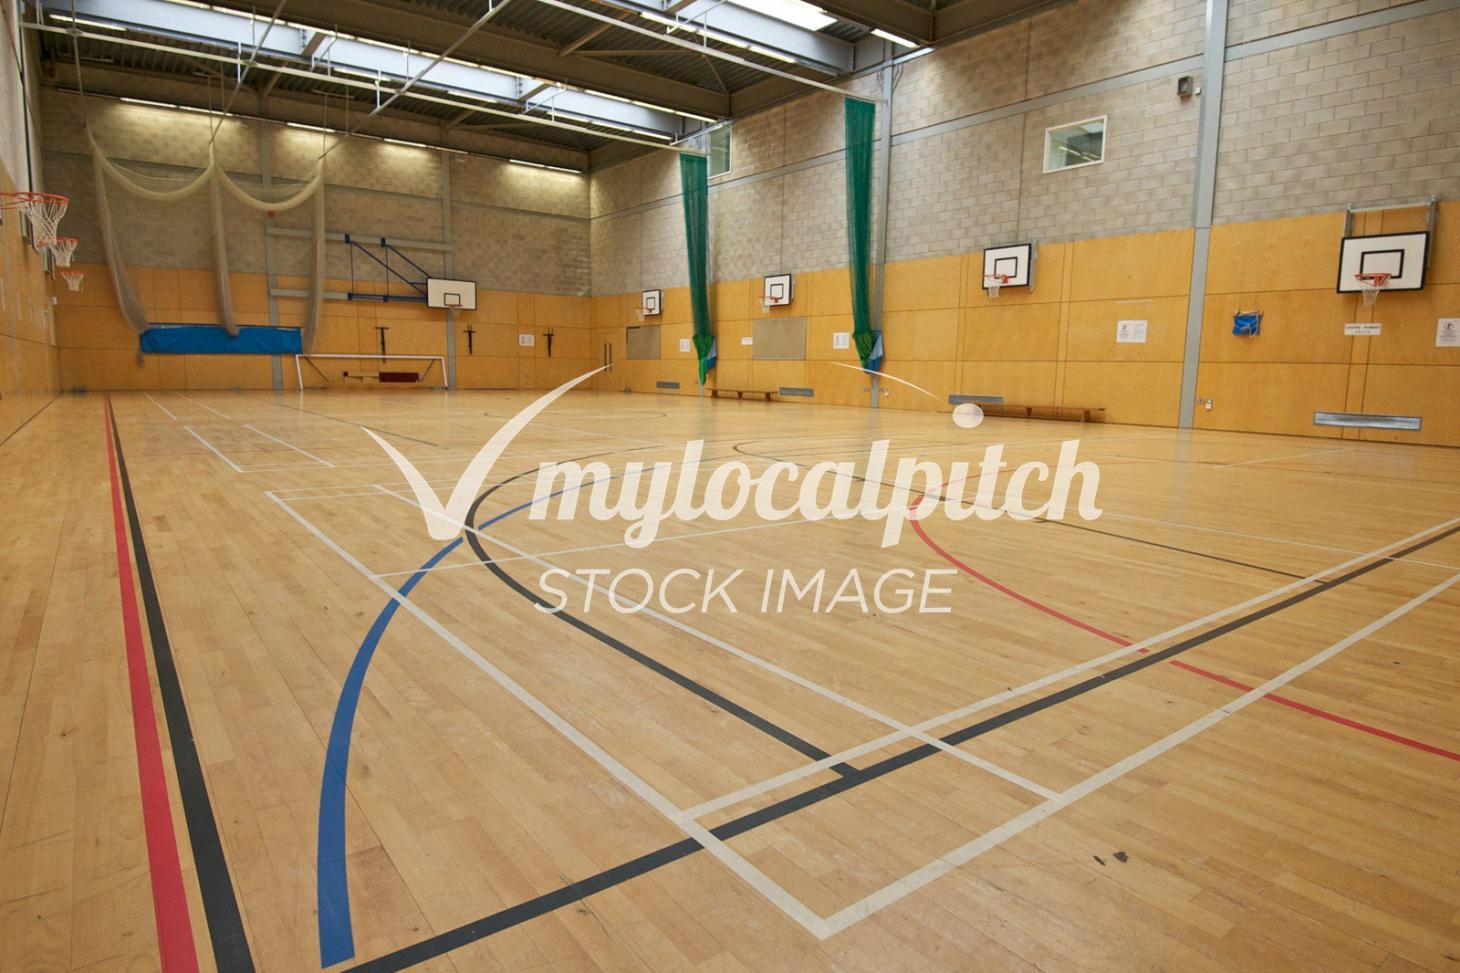 YMCA Thames Gateway Romford Branch Indoor basketball court